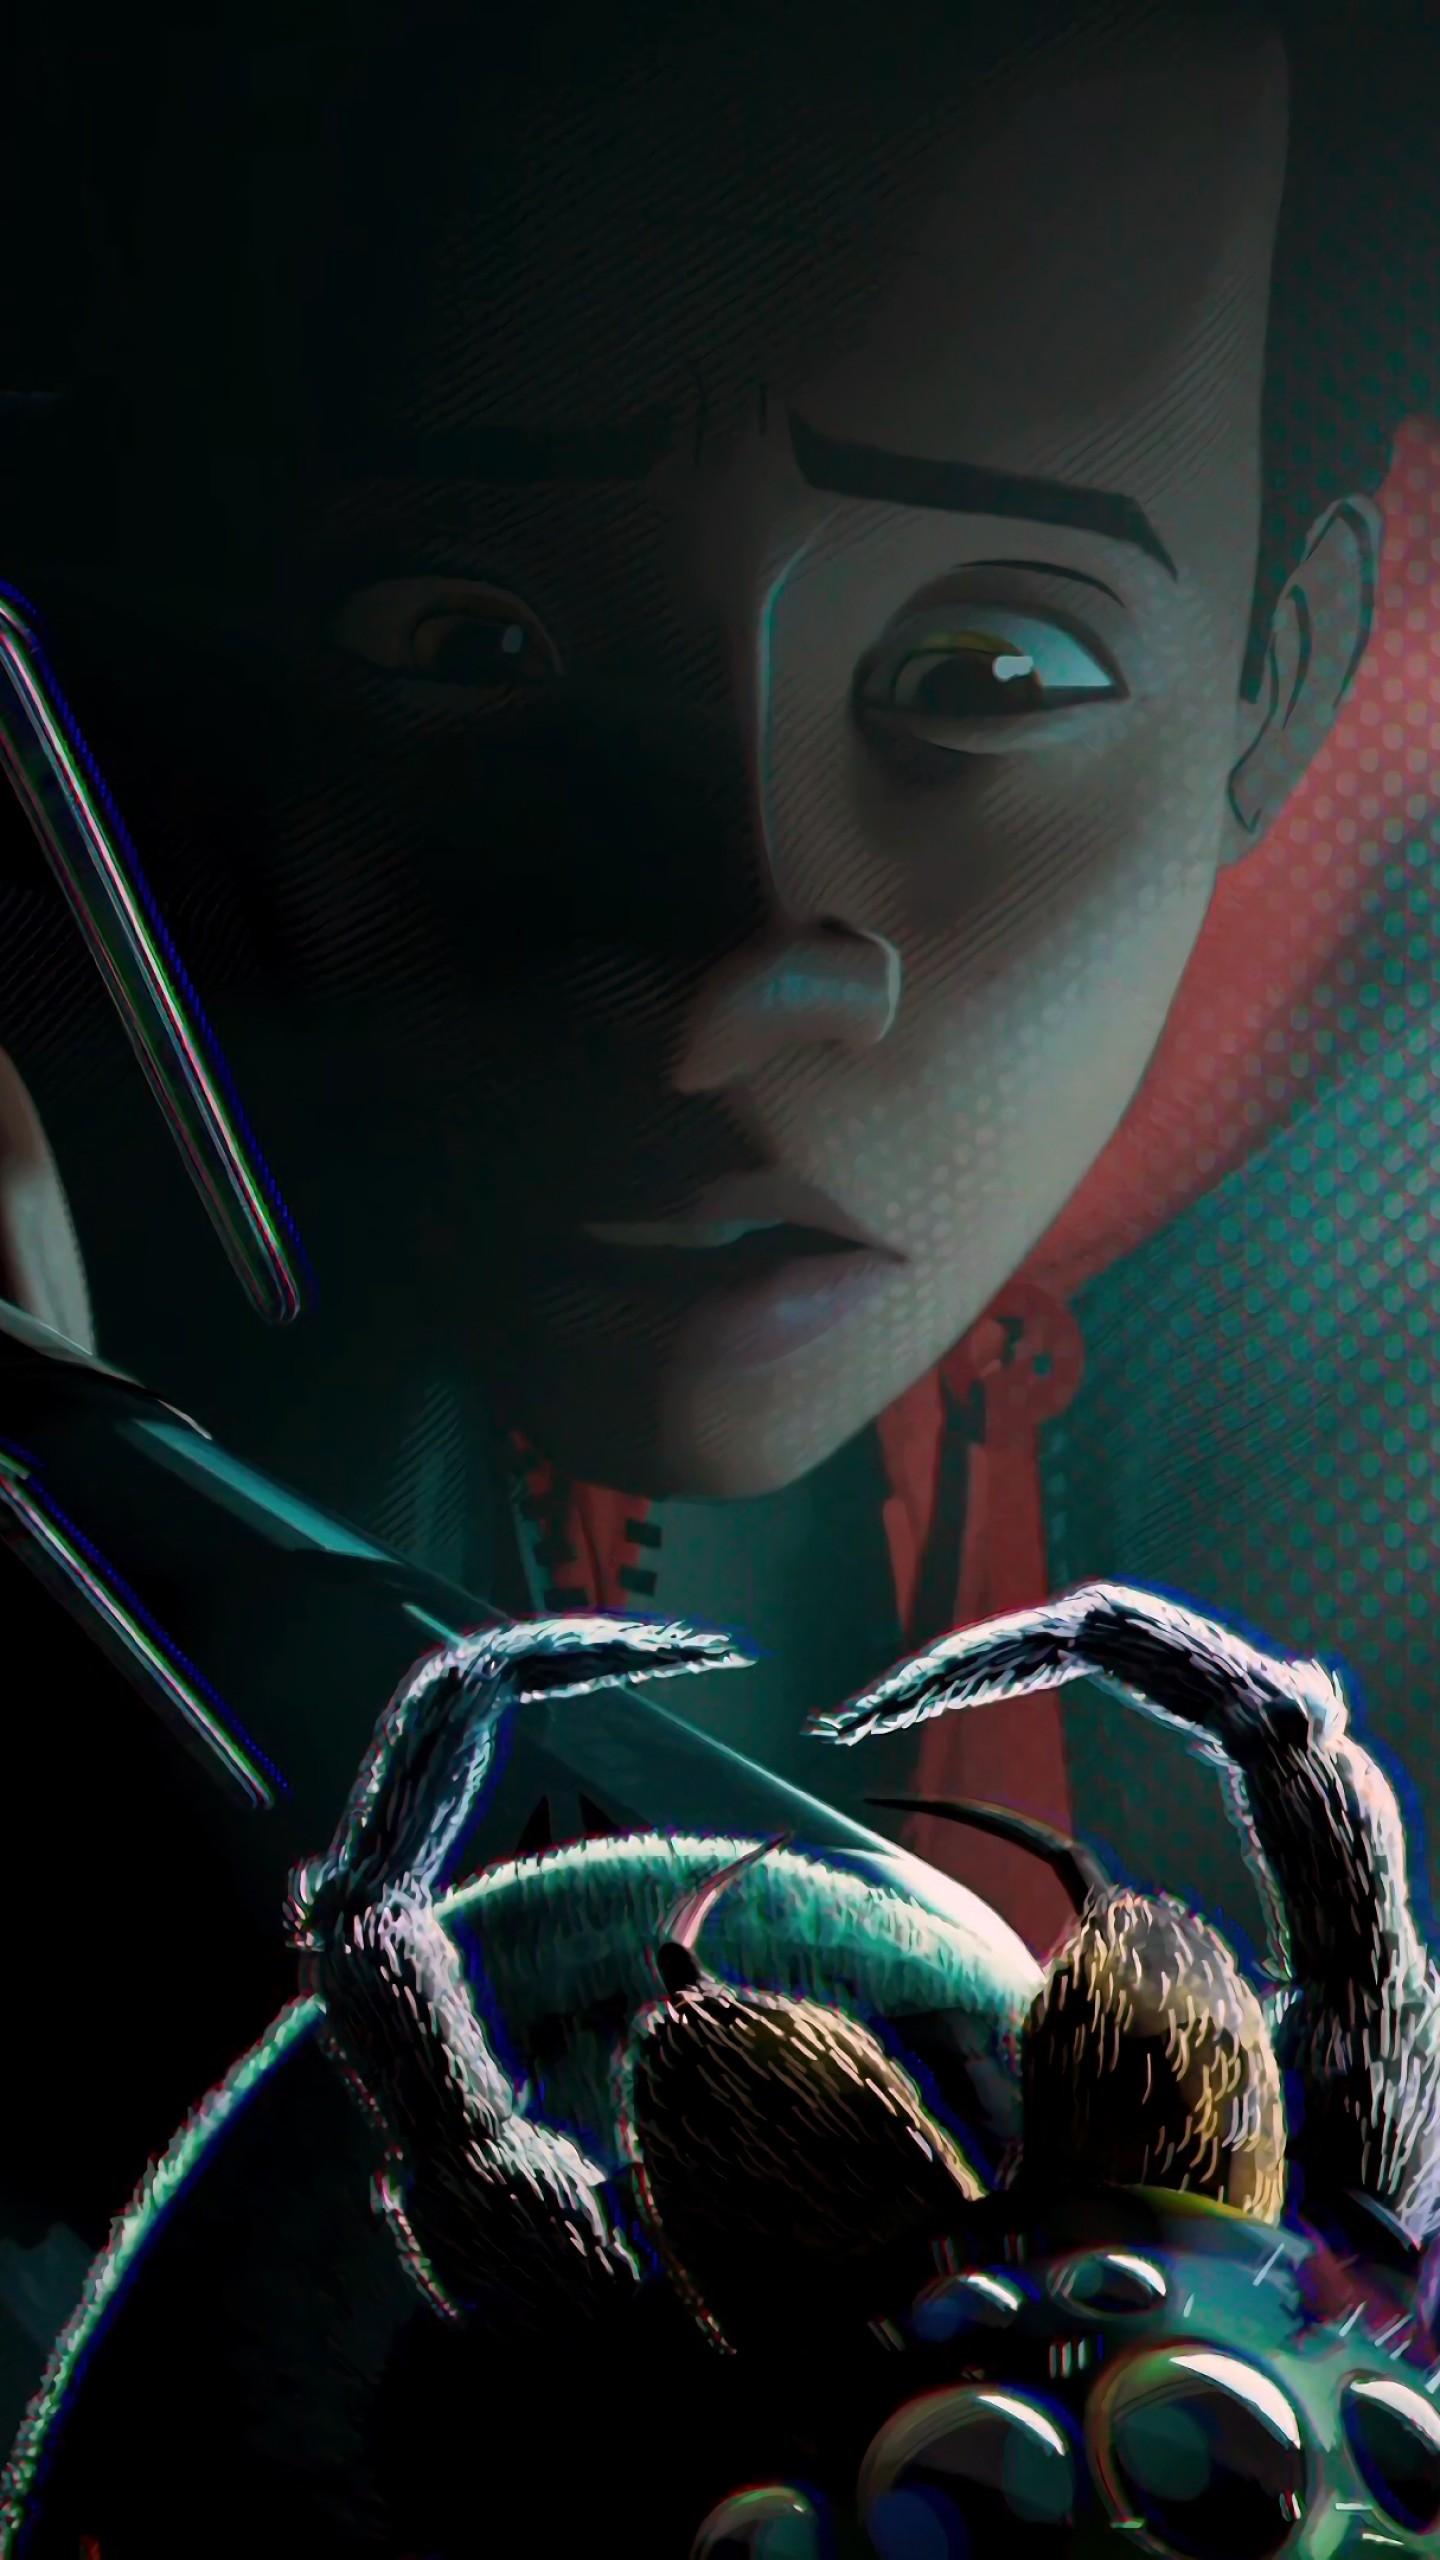 Wallpaper Spider Man Into The Spider Verse 4k Movies 17023